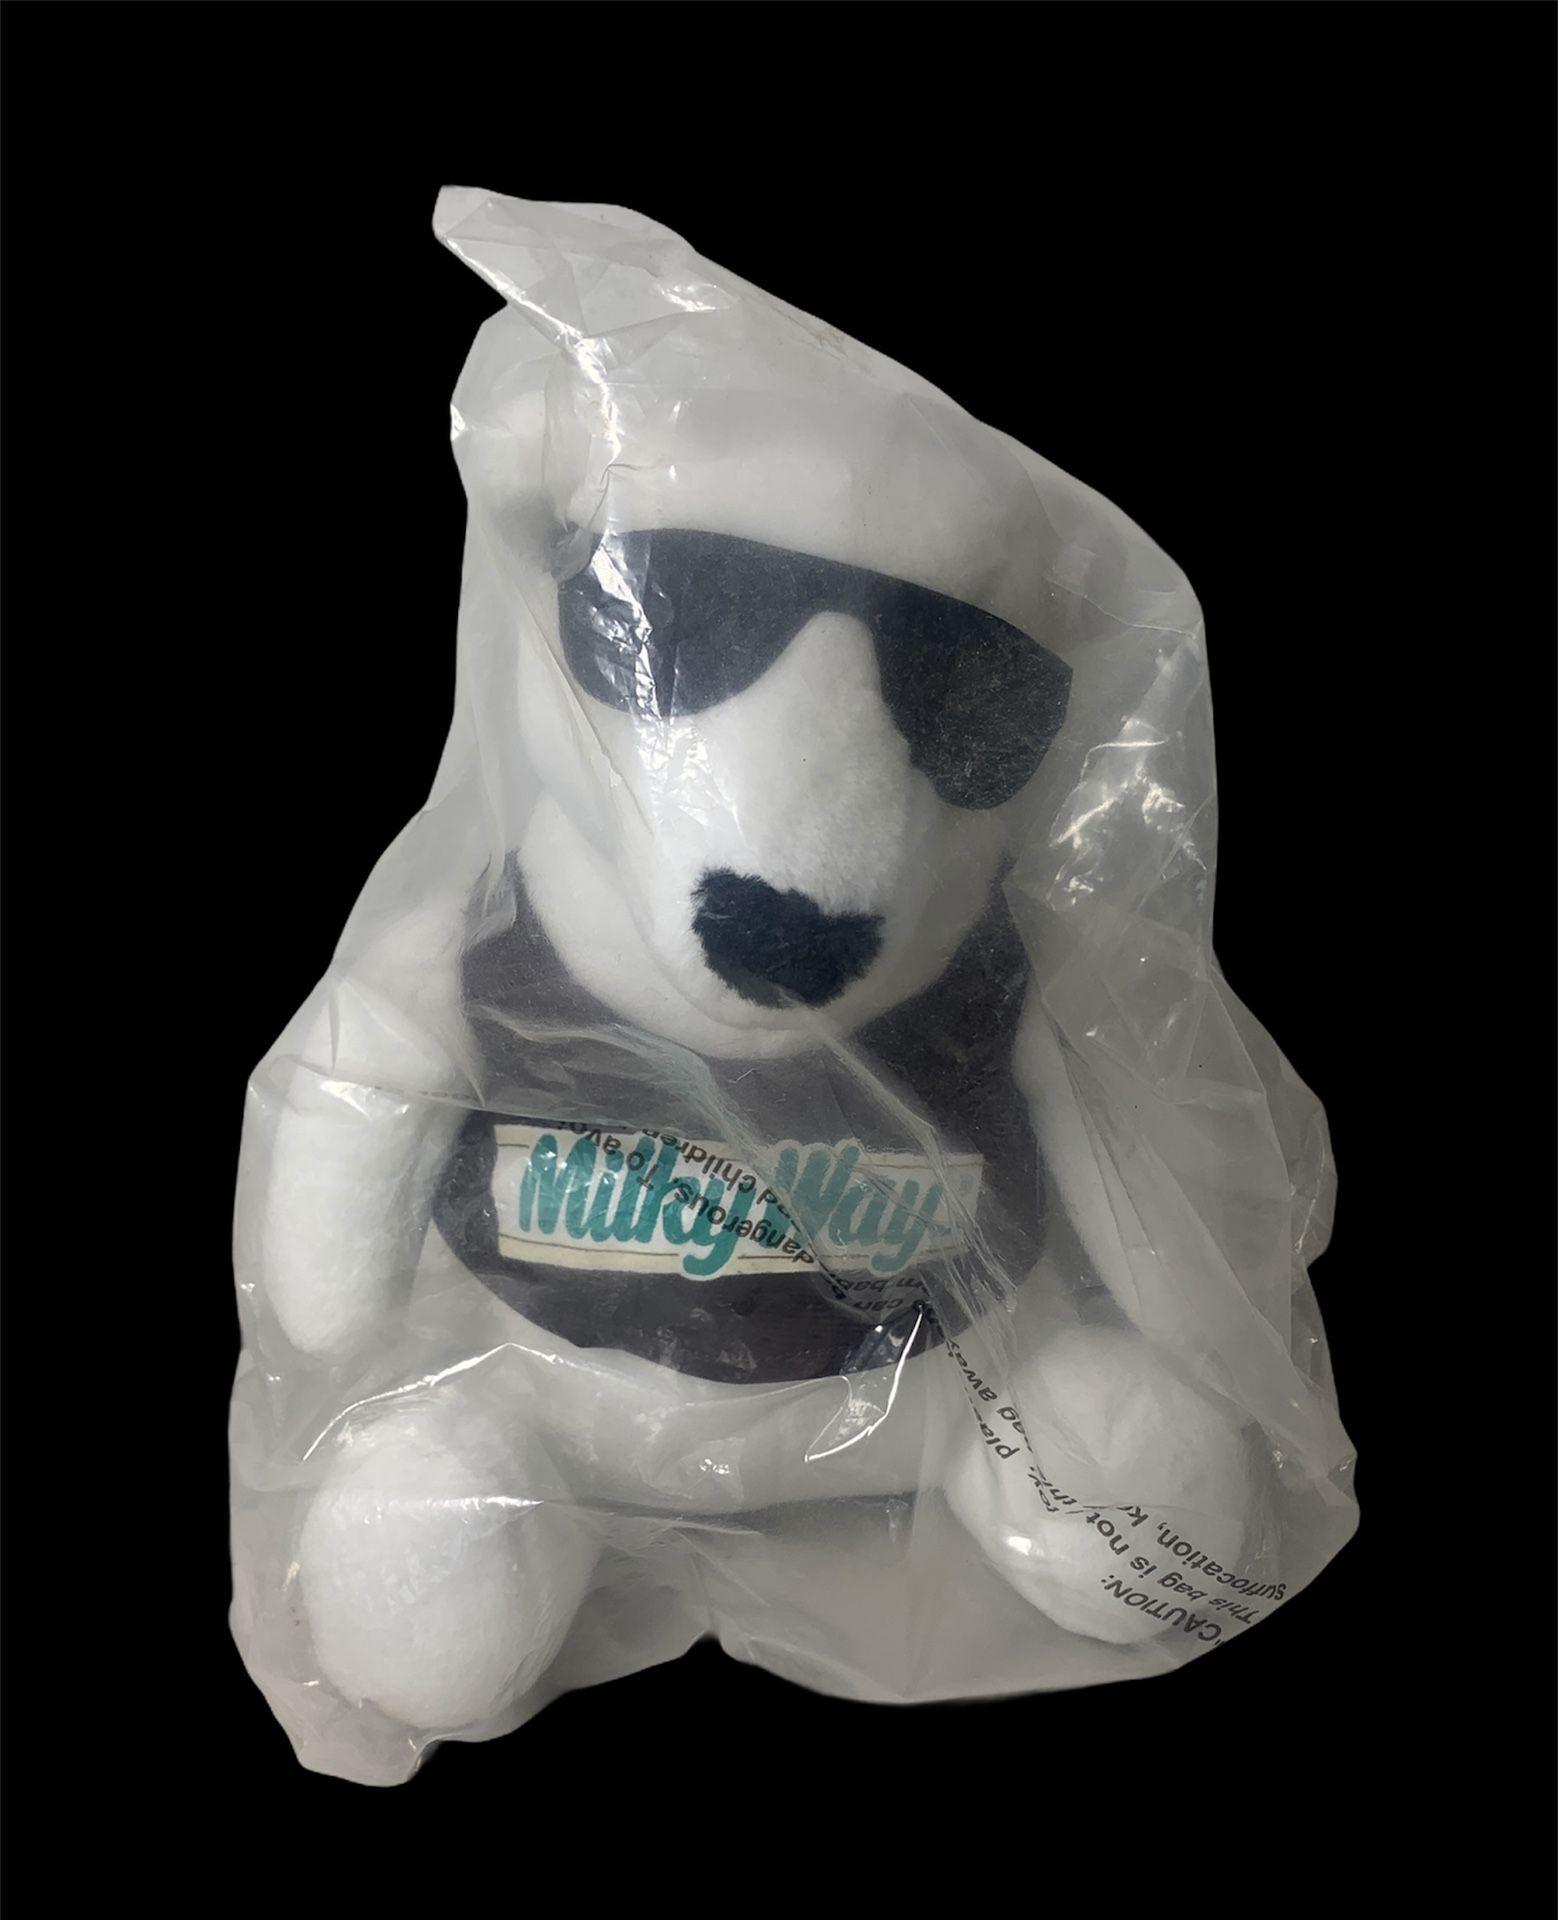 Milky Way Candy Bar Plush Polar Bear 1996 White With Sunglasses Mars 1996